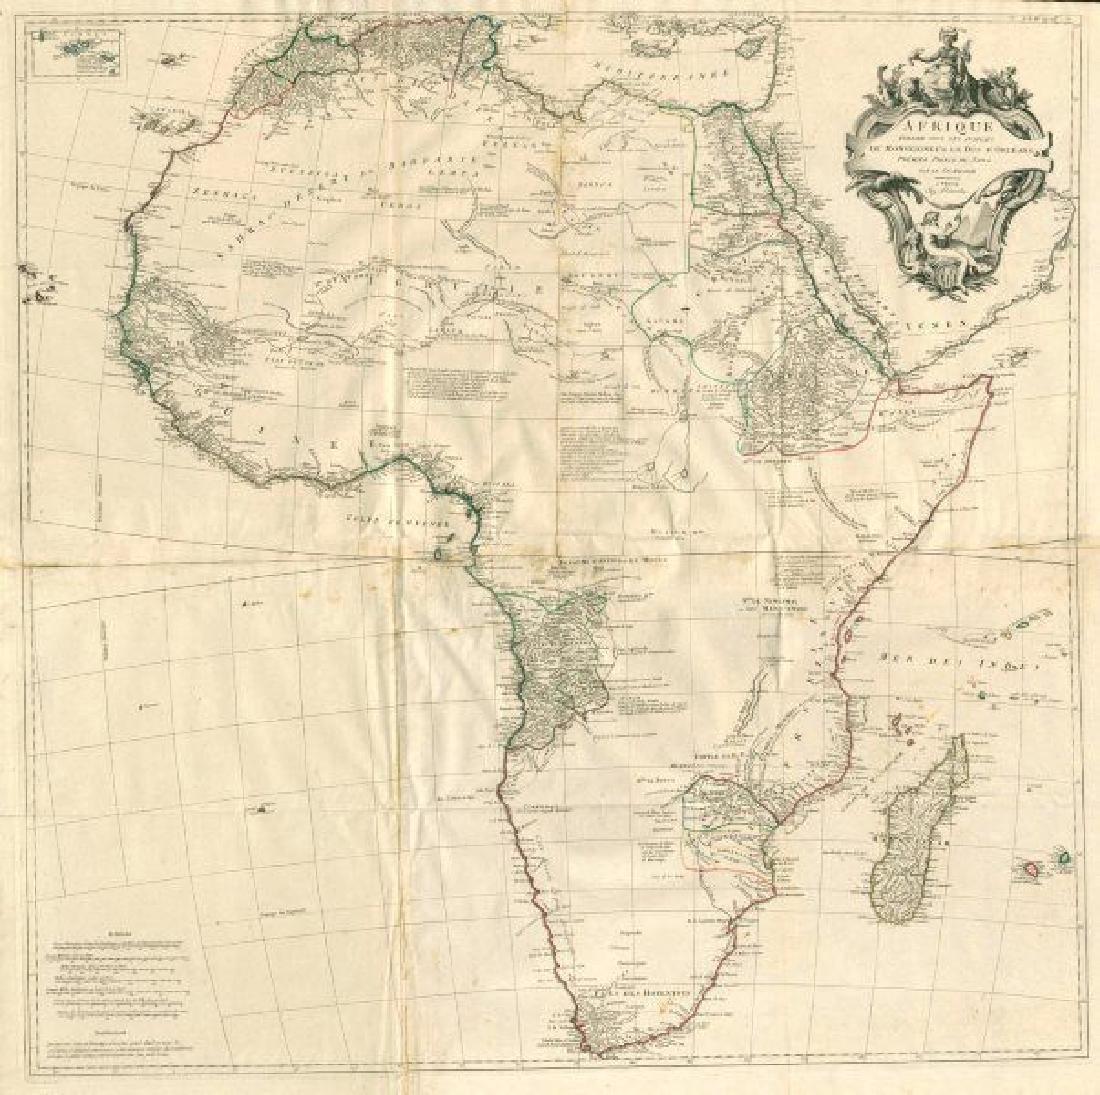 Santini / d'Anville: Antique Map of Africa, 1784